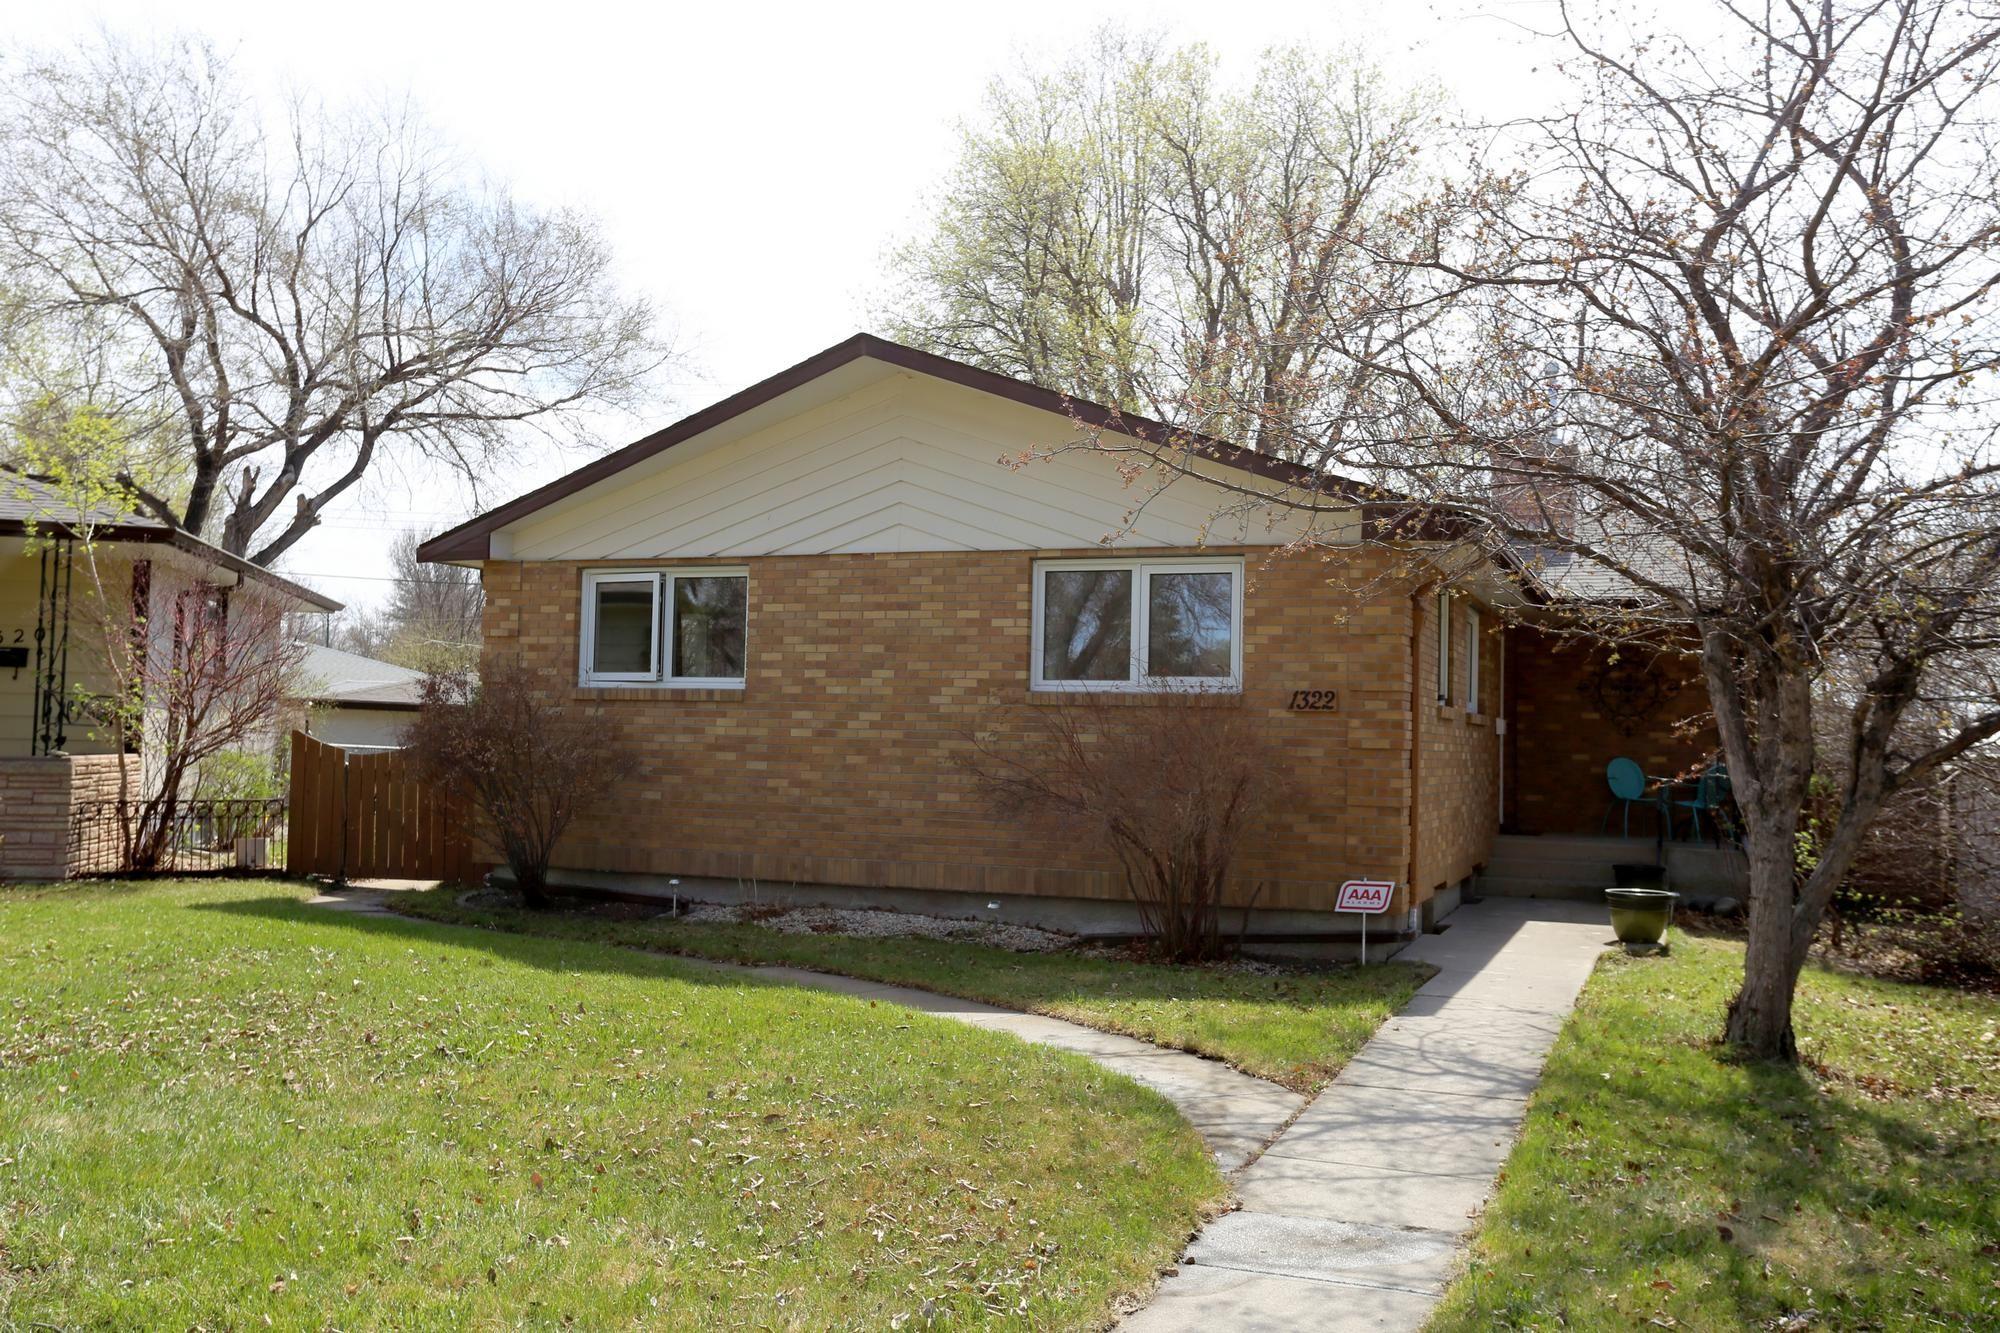 Photo 35: Photos: 1322 Valour Road in Winnipeg: Sargent Park Single Family Detached for sale (5C)  : MLS®# 1811835